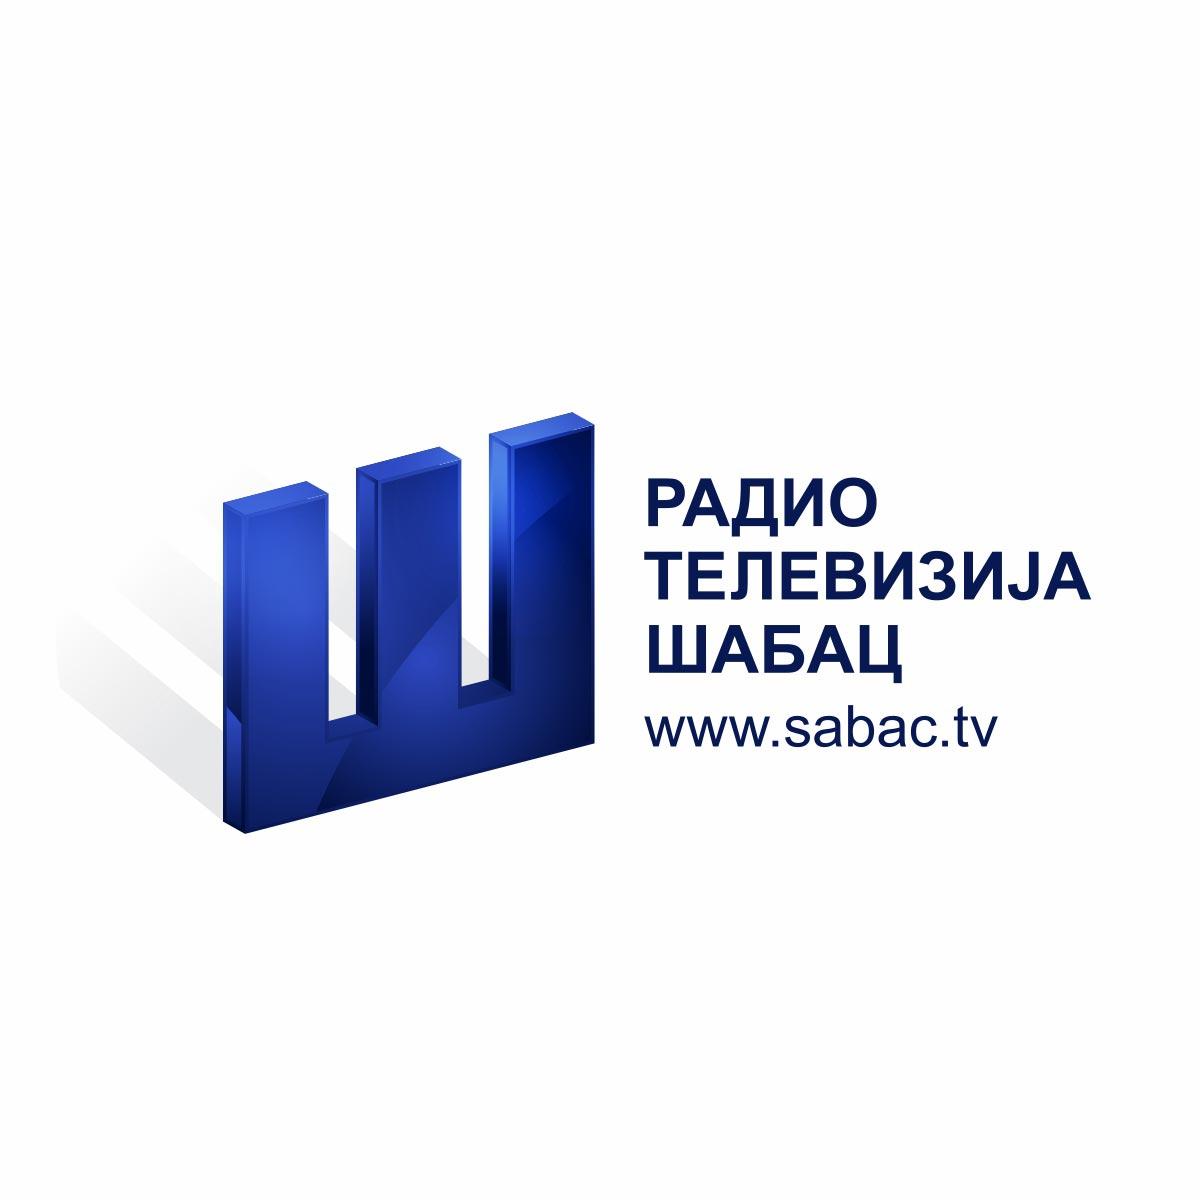 RTV Šabac logo design